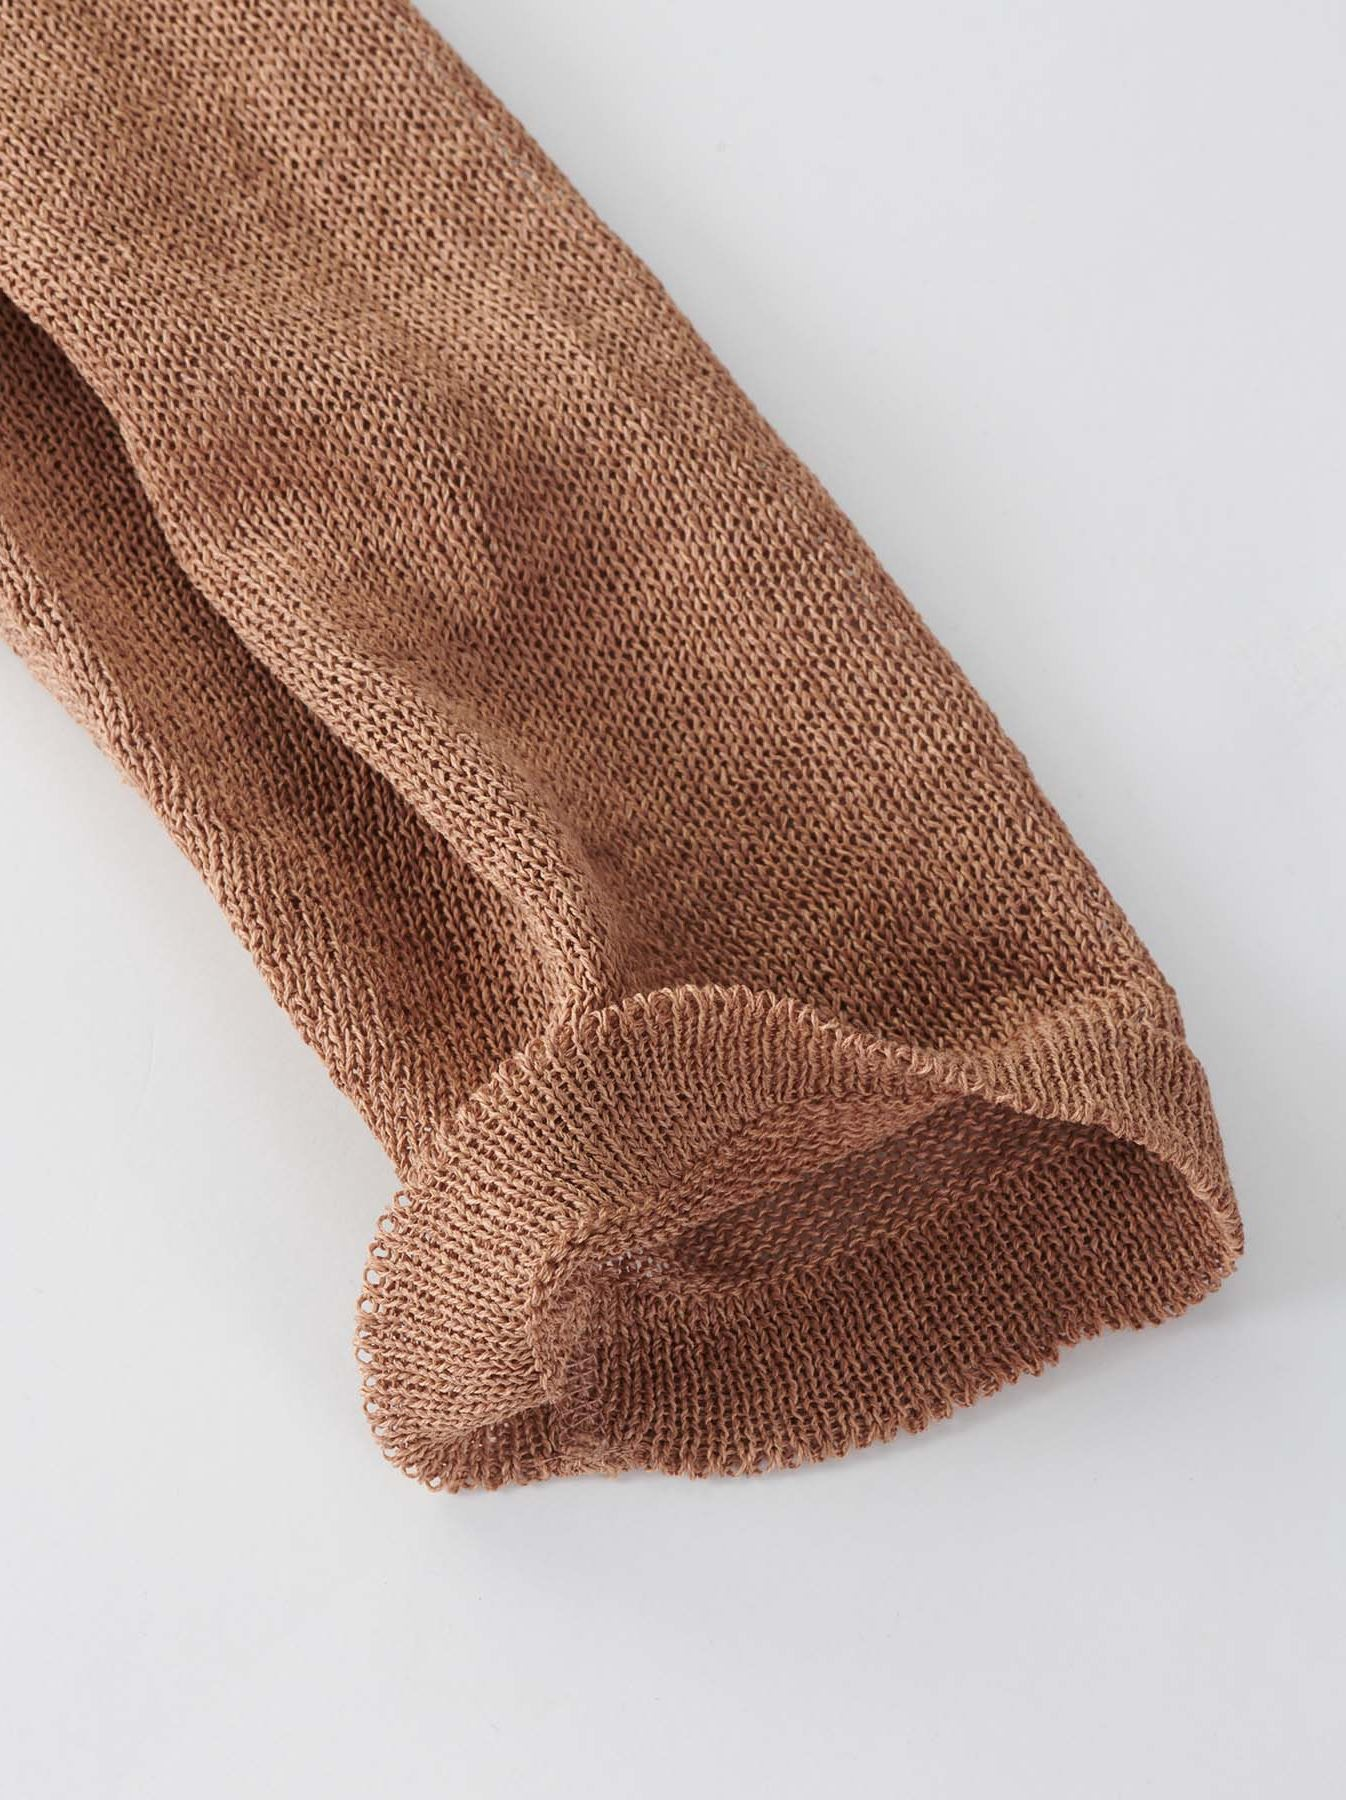 WH Gima Knit Long-sleeved T-shirt-8